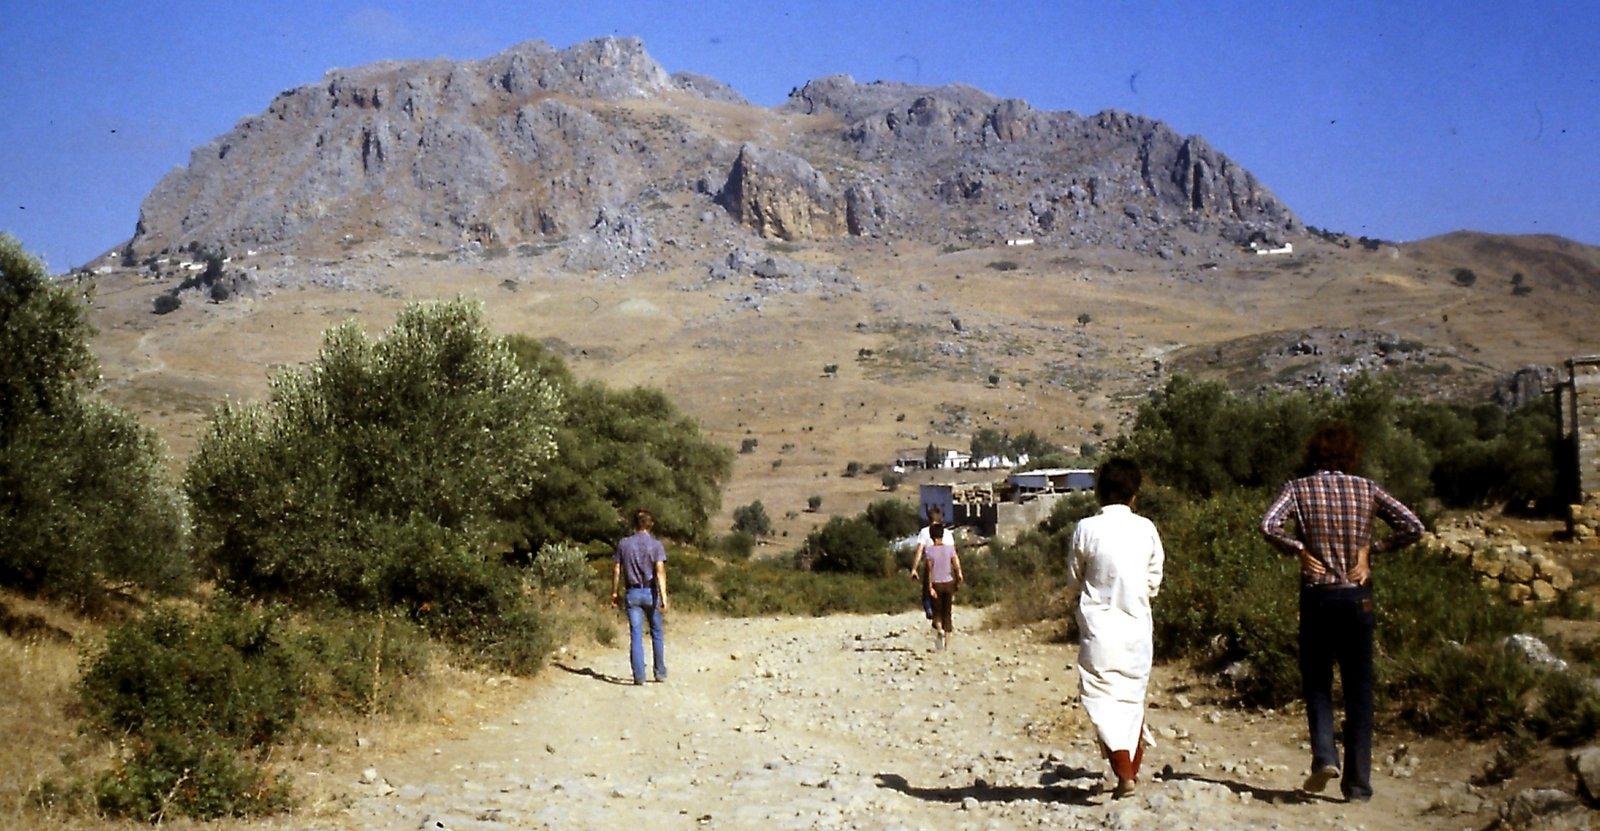 Wanderung im Rifgebirge Marokko